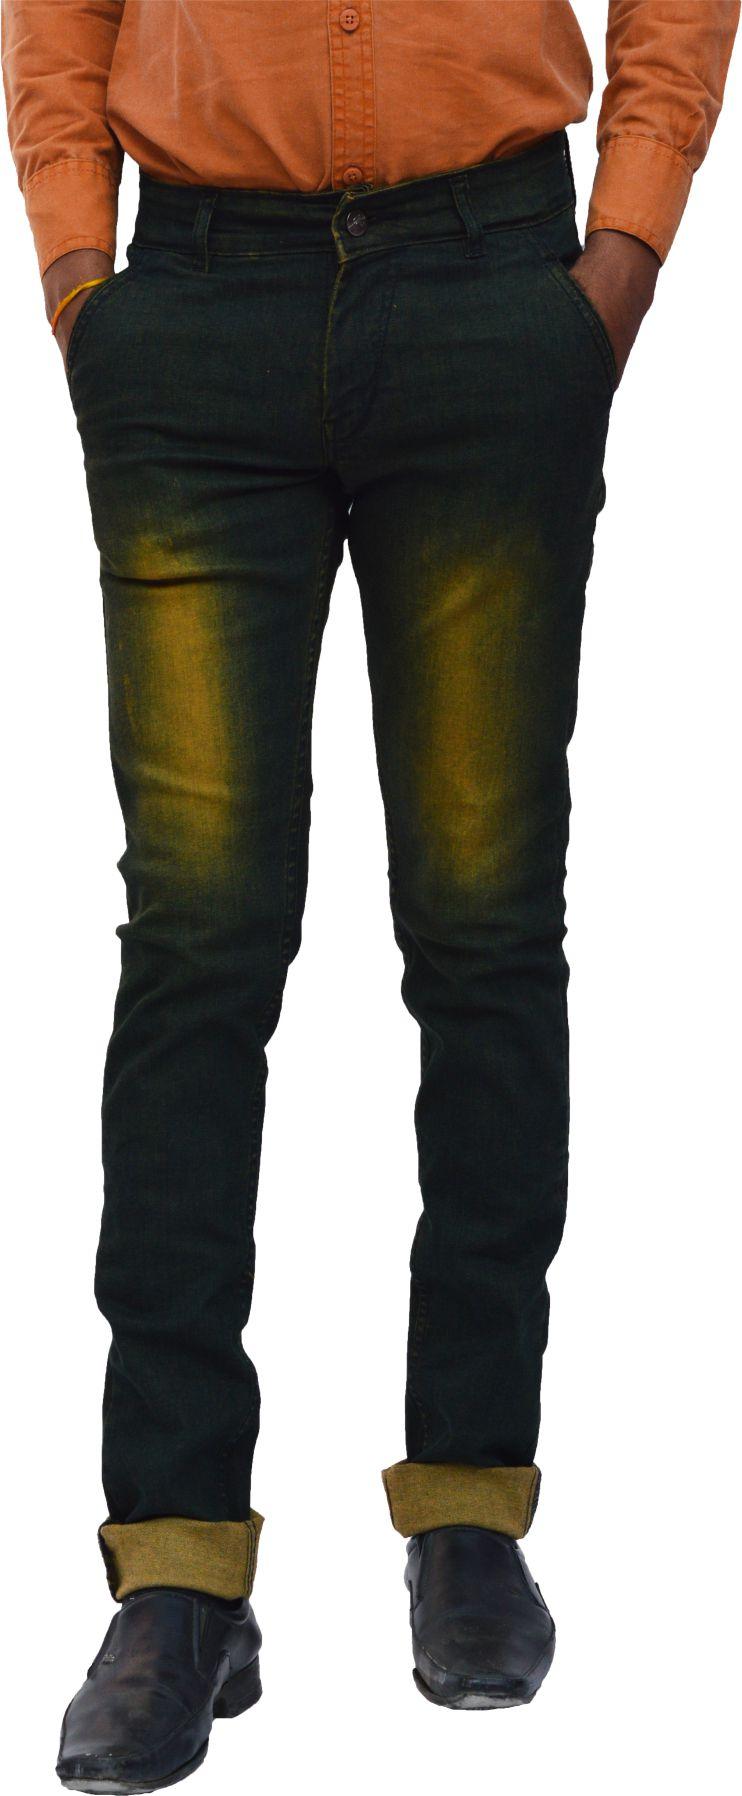 FunTree Light Green Regular Fit Jeans